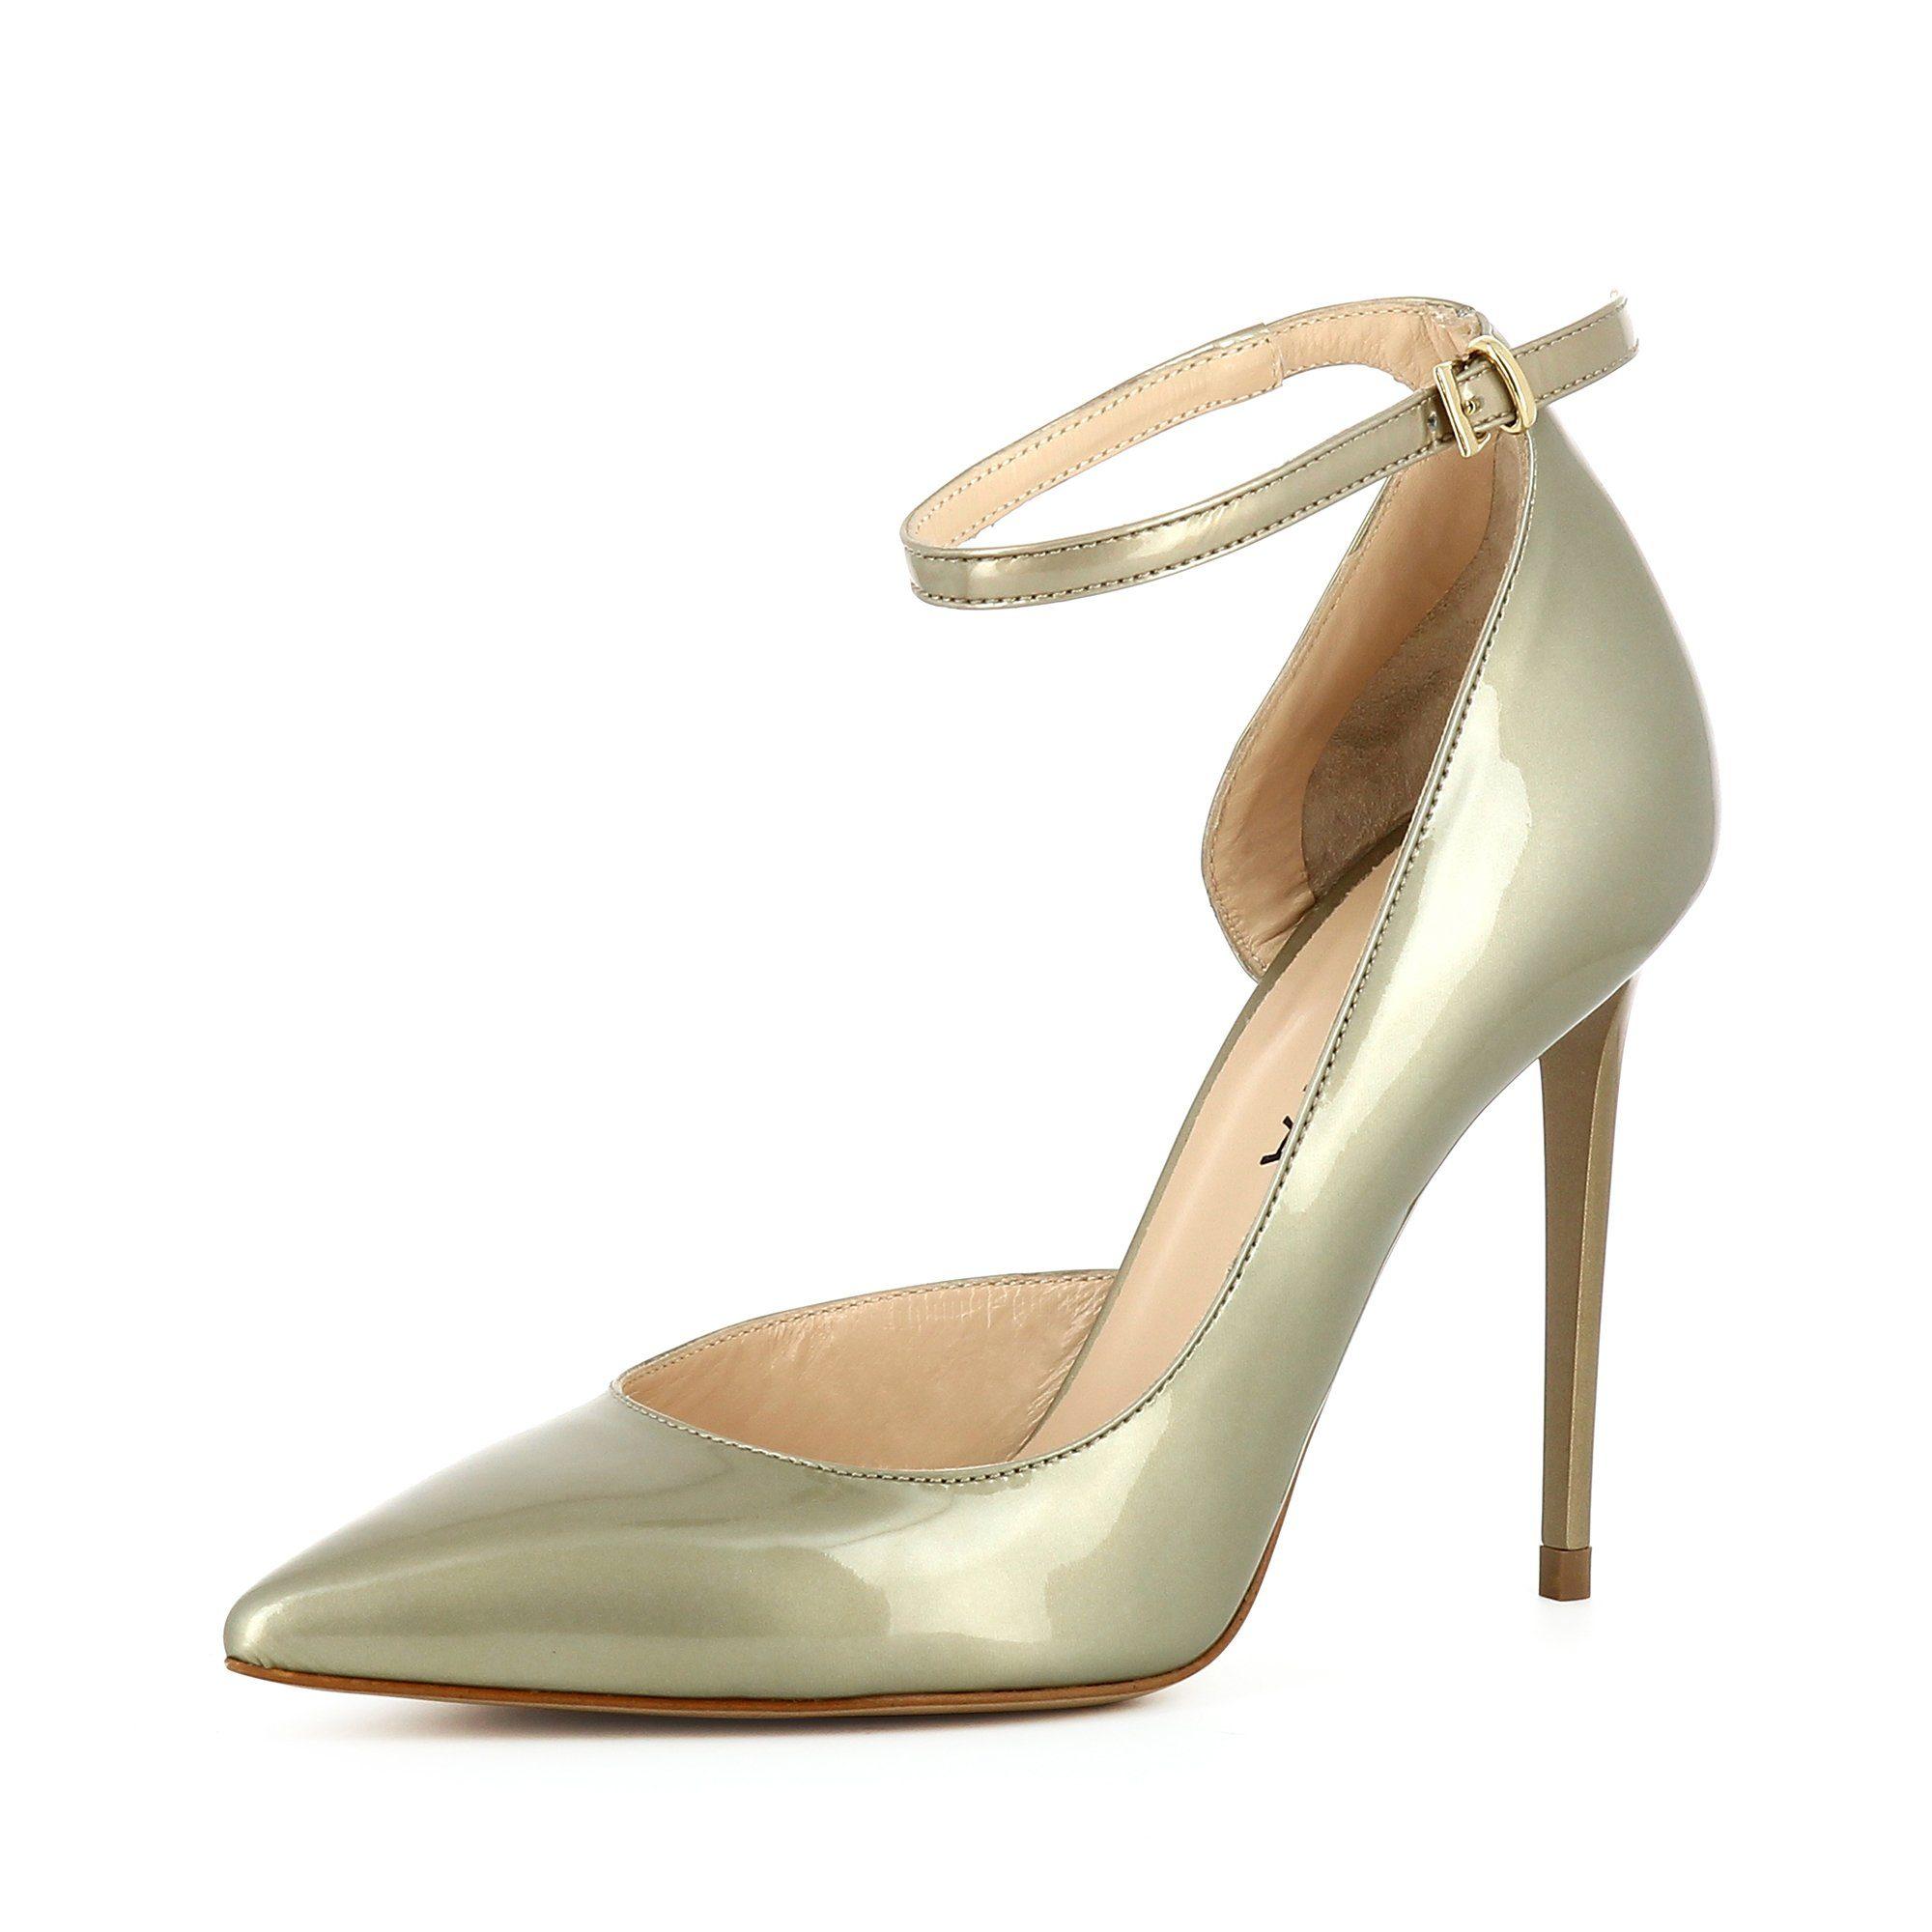 Evita ALINA High-Heel-Pumps online kaufen  goldfarben